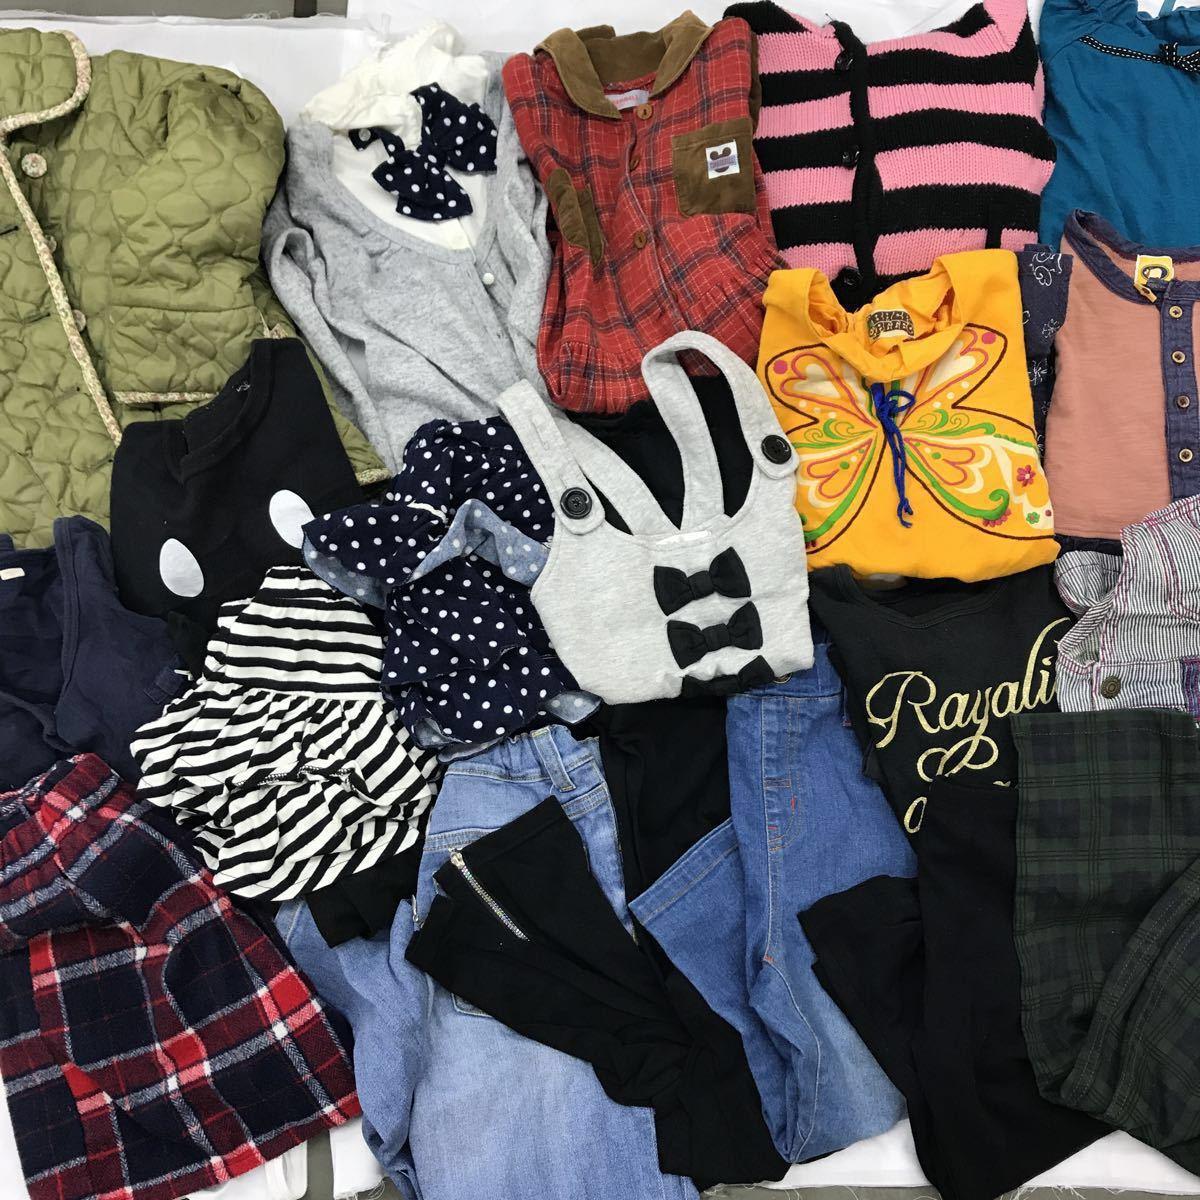 d36cb2aaf8553 SR-77 キッズ 女の子 20点 130cm まとめ売り まとめて アウター トレナー ズボン スカート